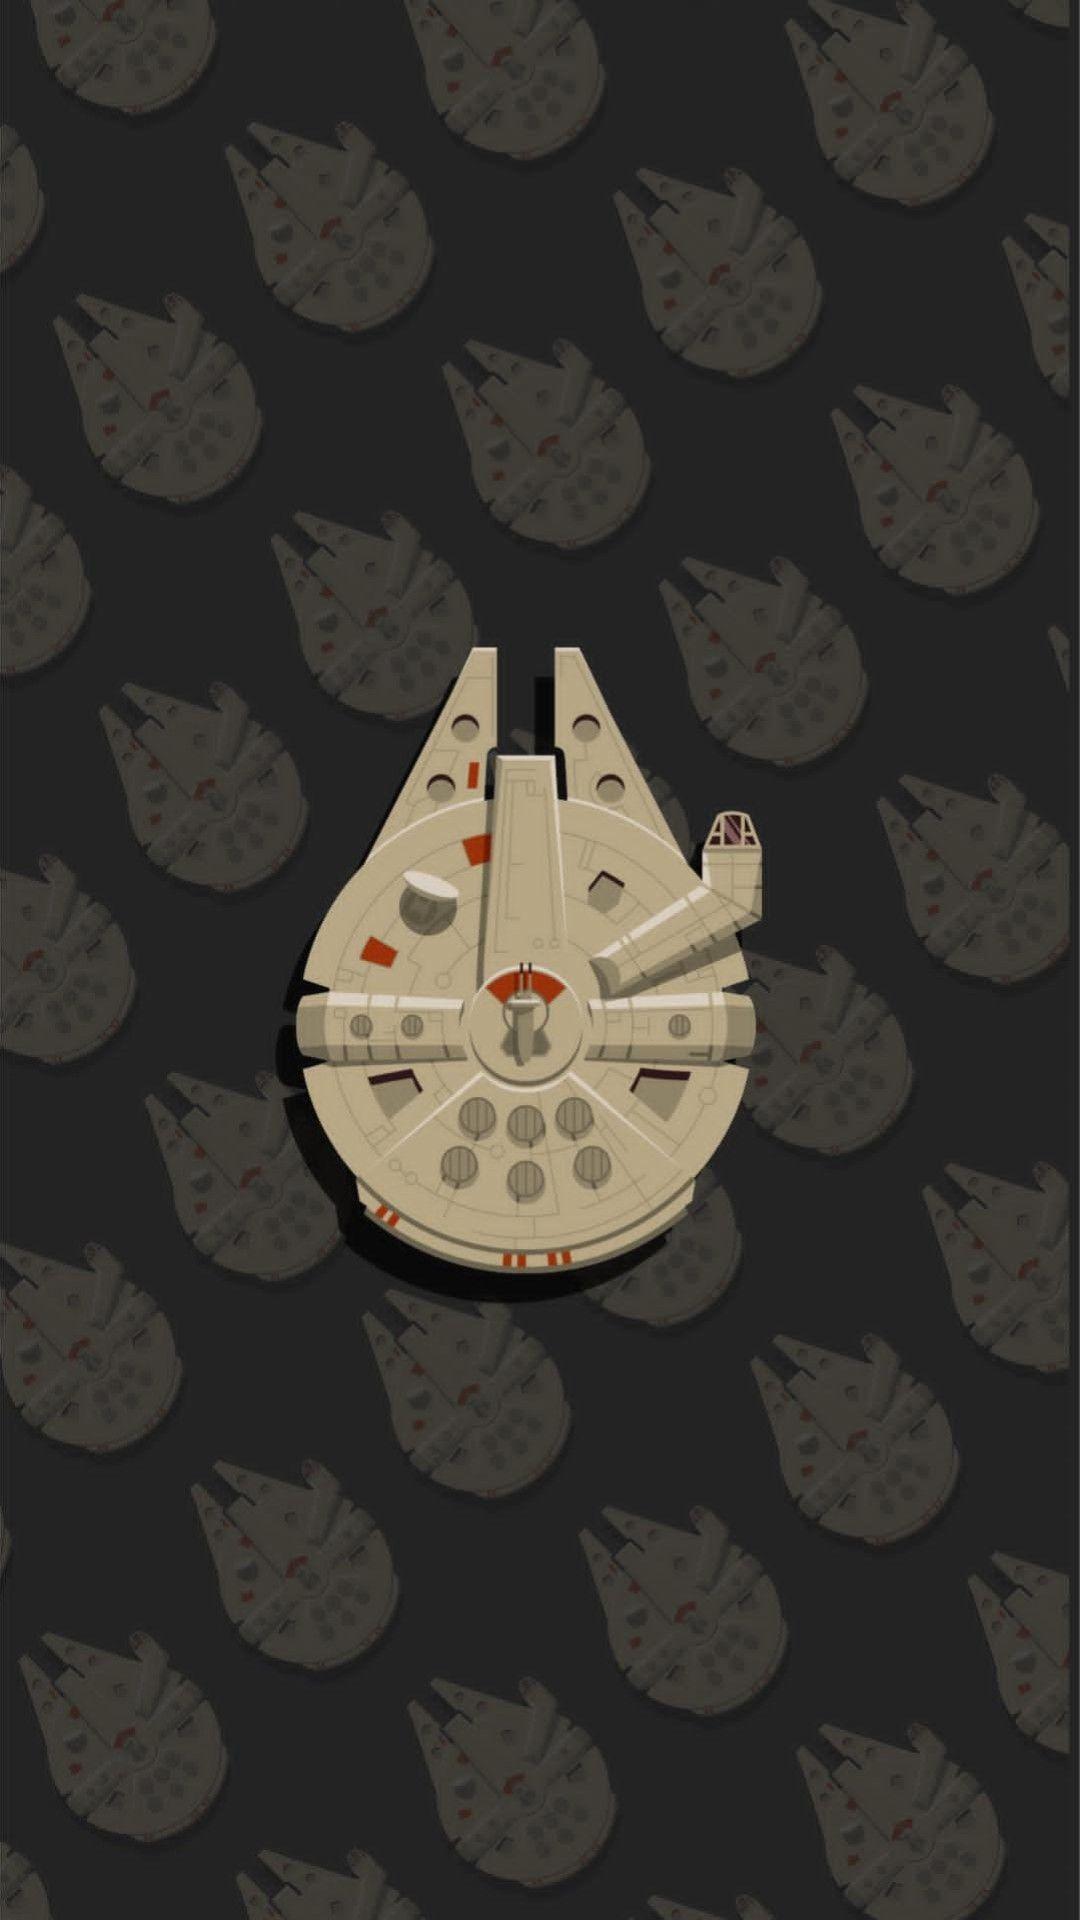 Pin De Brianna Macmahon Em Creation Papel De Parede Star Wars Tatuagem Star Wars Star Wars Wallpapers